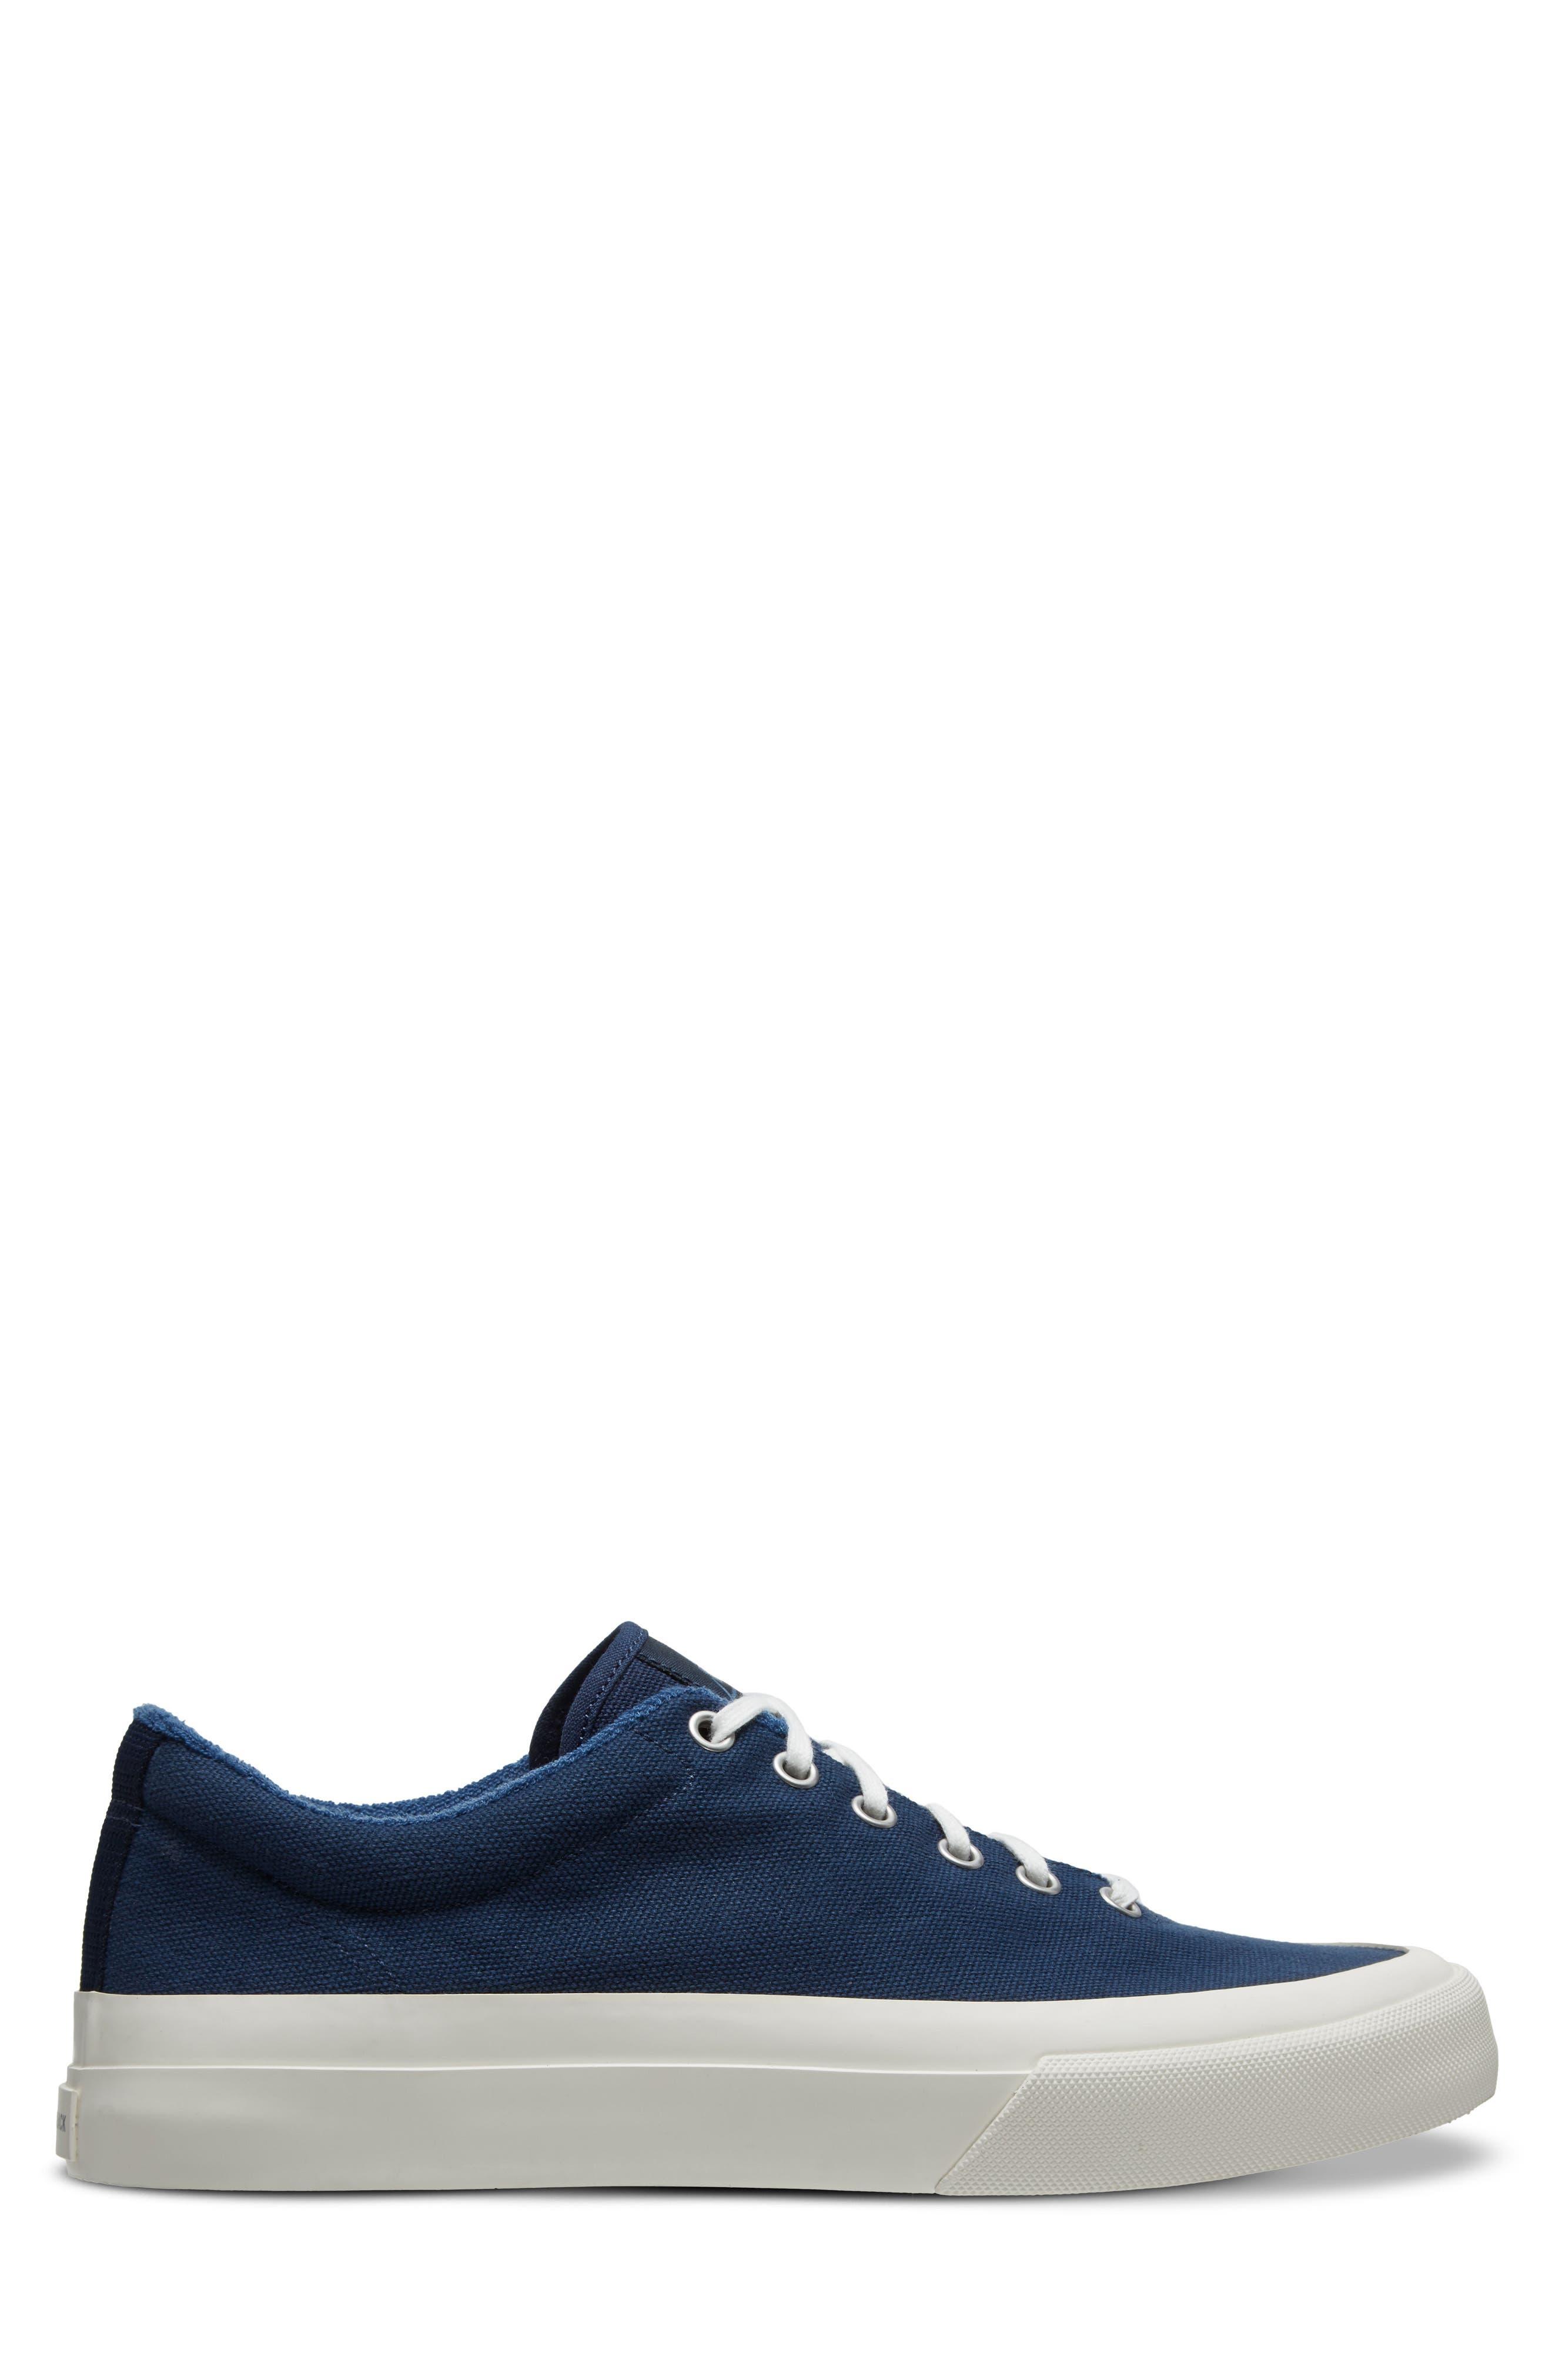 Vesta Low Top Sneaker,                             Alternate thumbnail 3, color,                             Navy